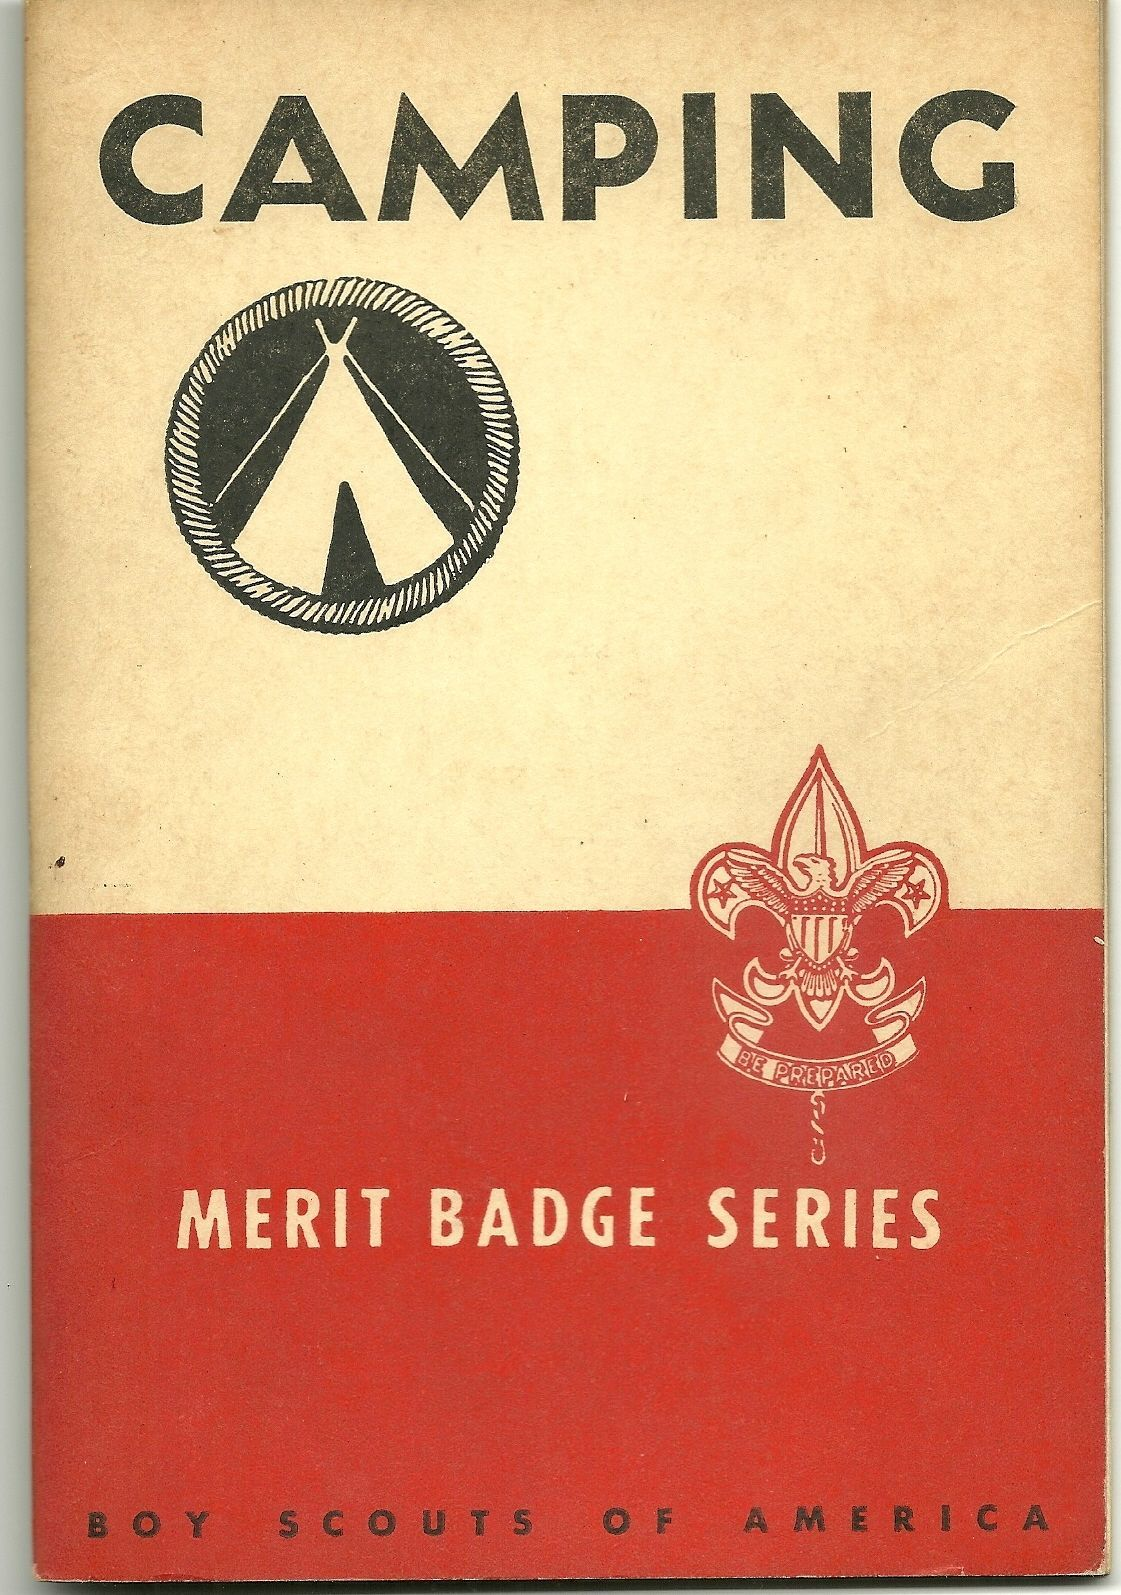 Vintage Boy Scouts Of America Camping Merit Badge Series